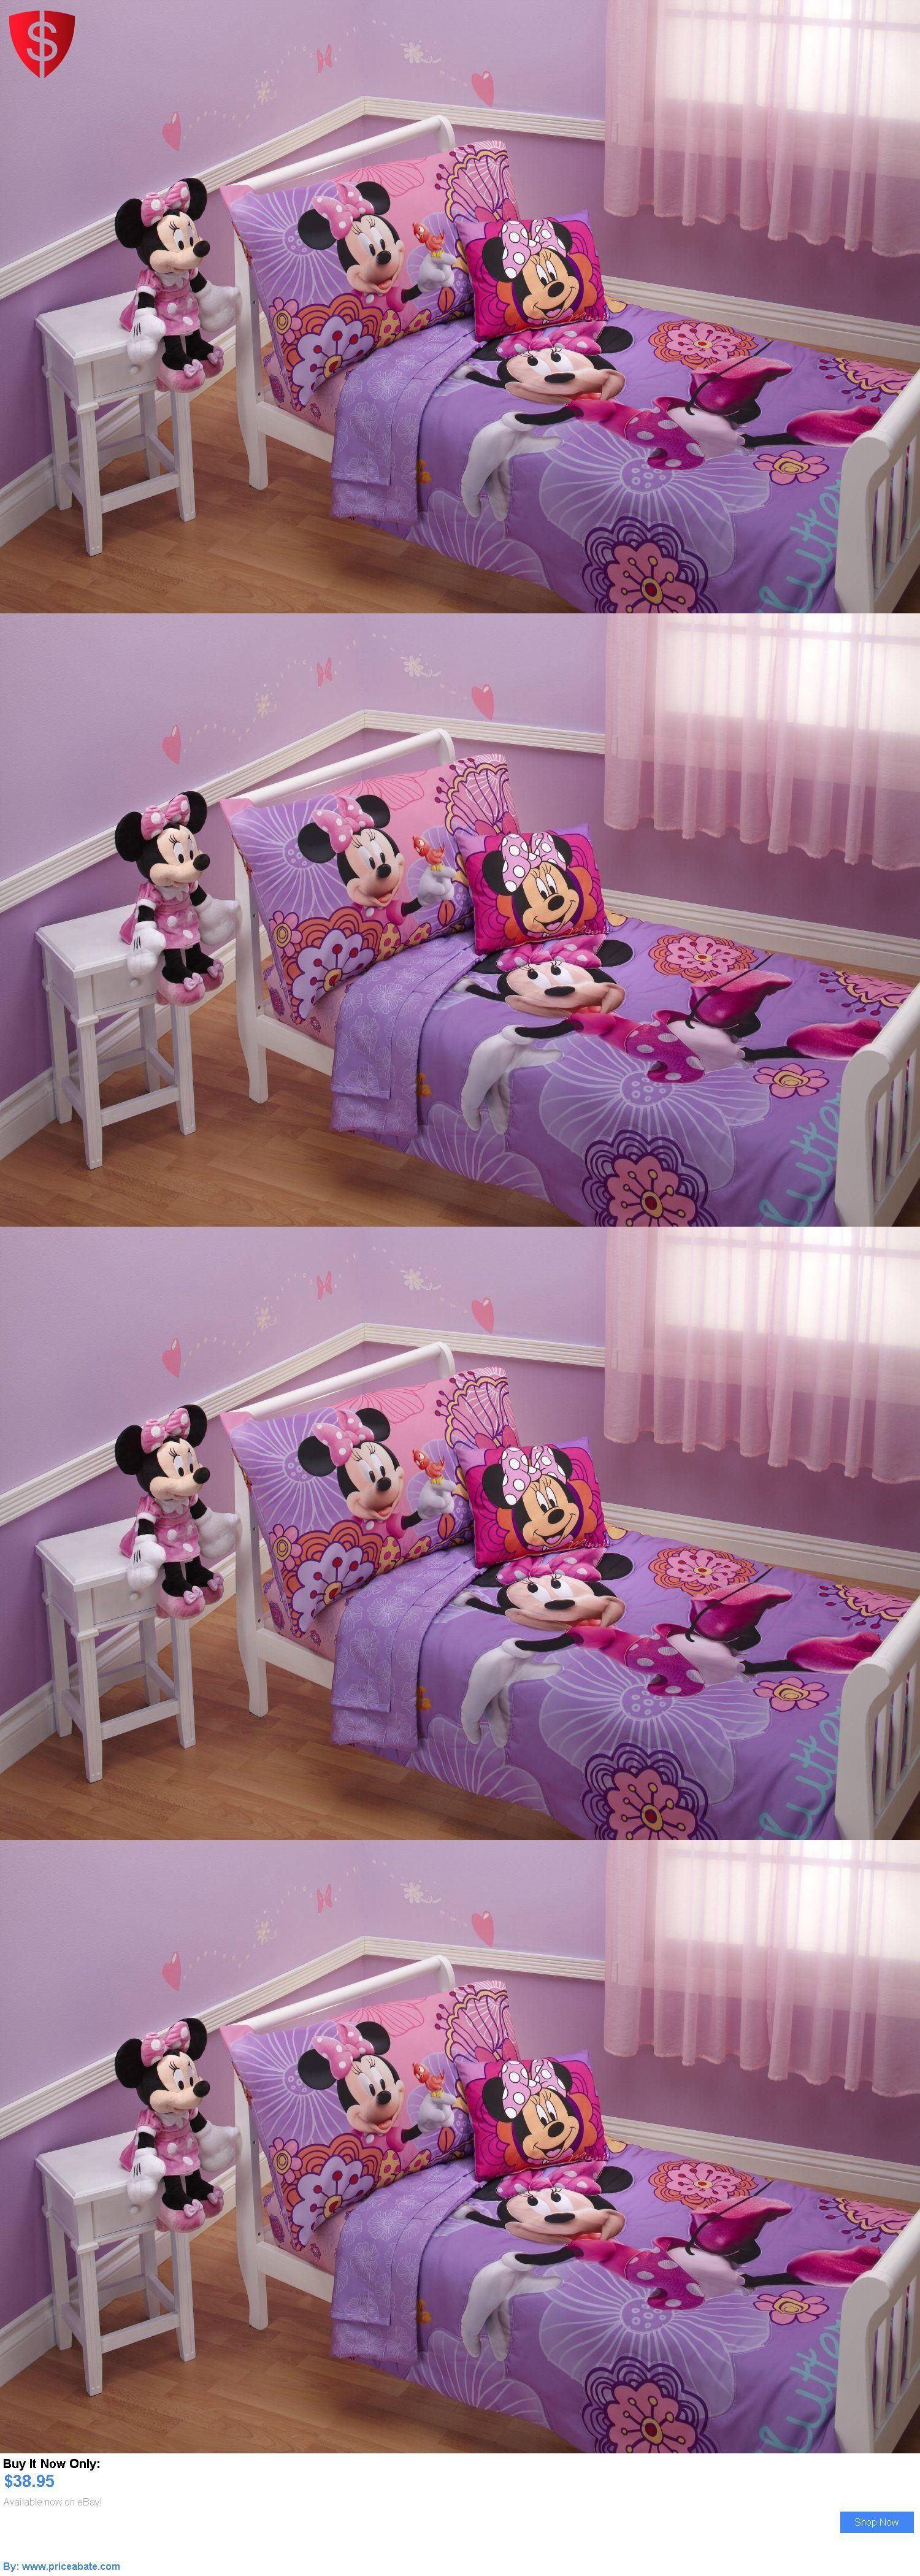 Kids Bedding 4 Piece Minnie Mouse Disney Bedding Set Girls